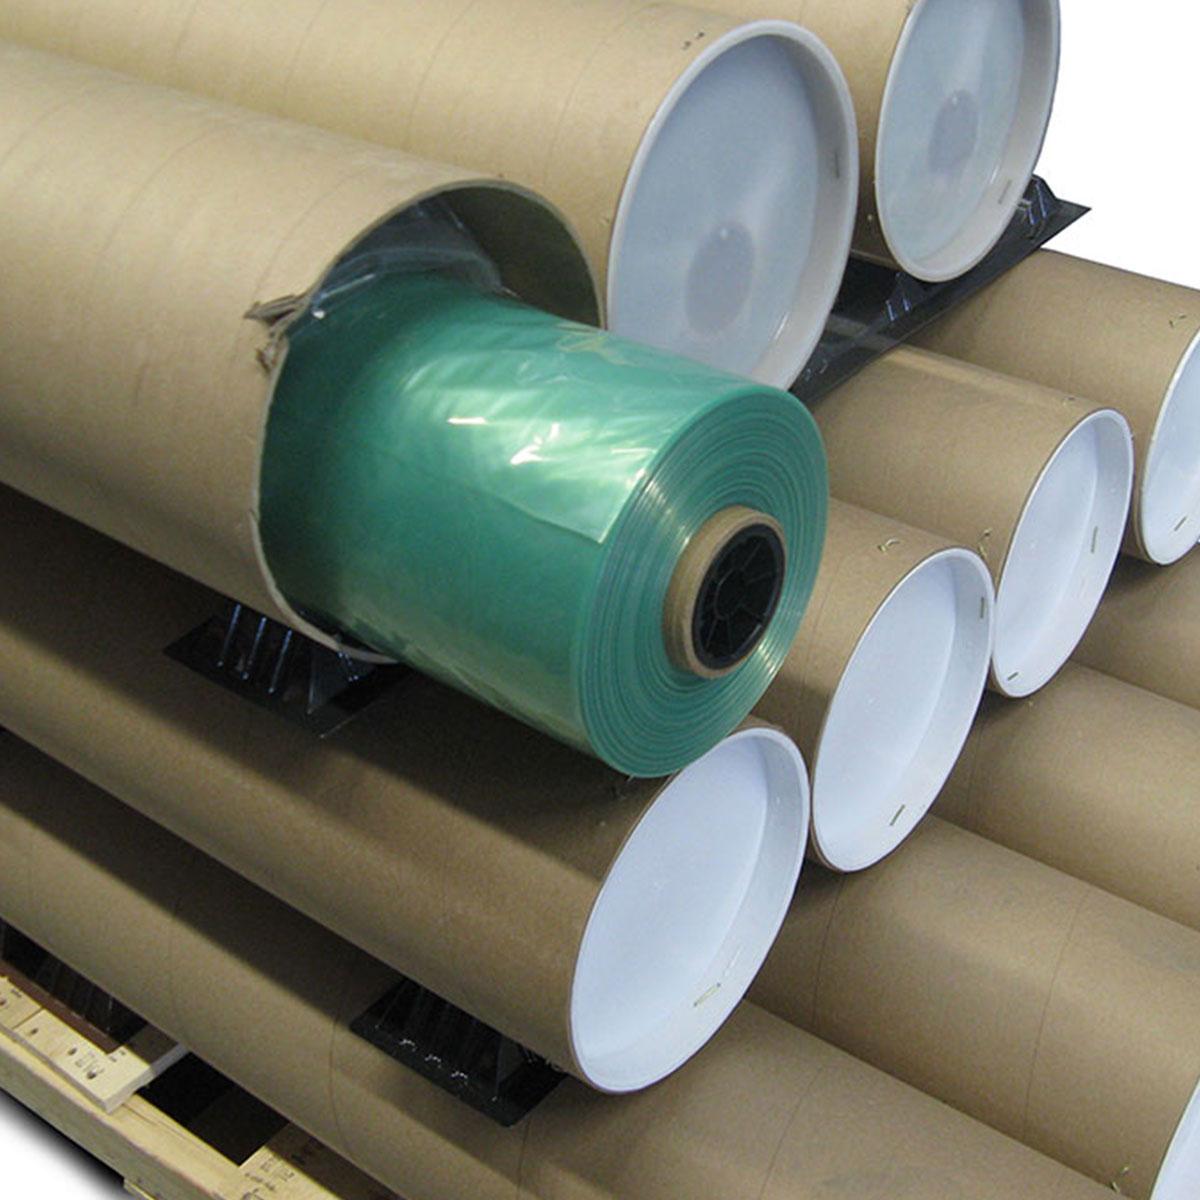 vacuum bag nylon 1200 green lft 0050mm x 1200mm 720m 0002 x 48